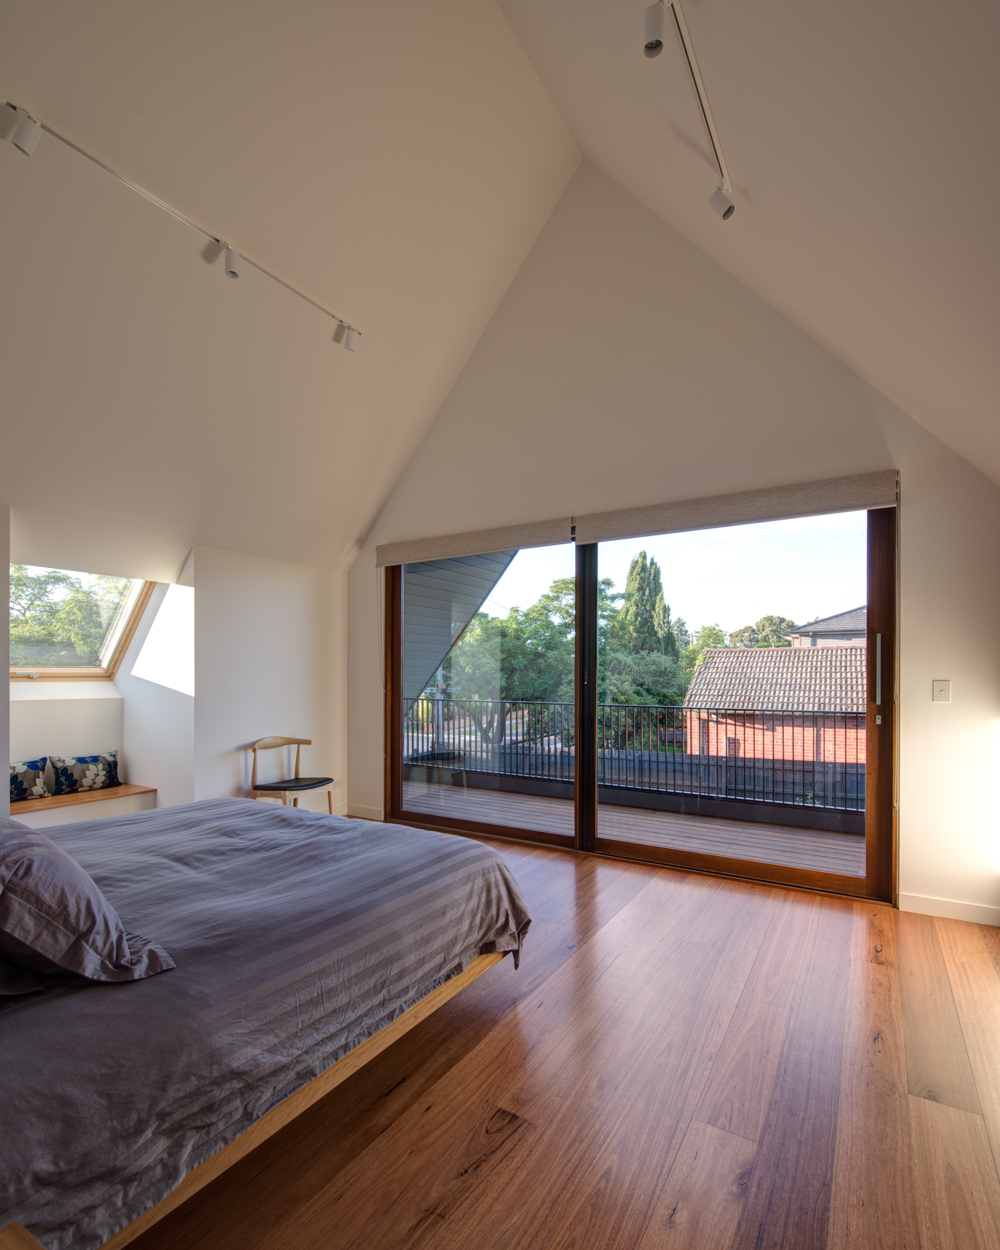 ford-street-house-chaulk-studio-the-design-emotive-11.jpg